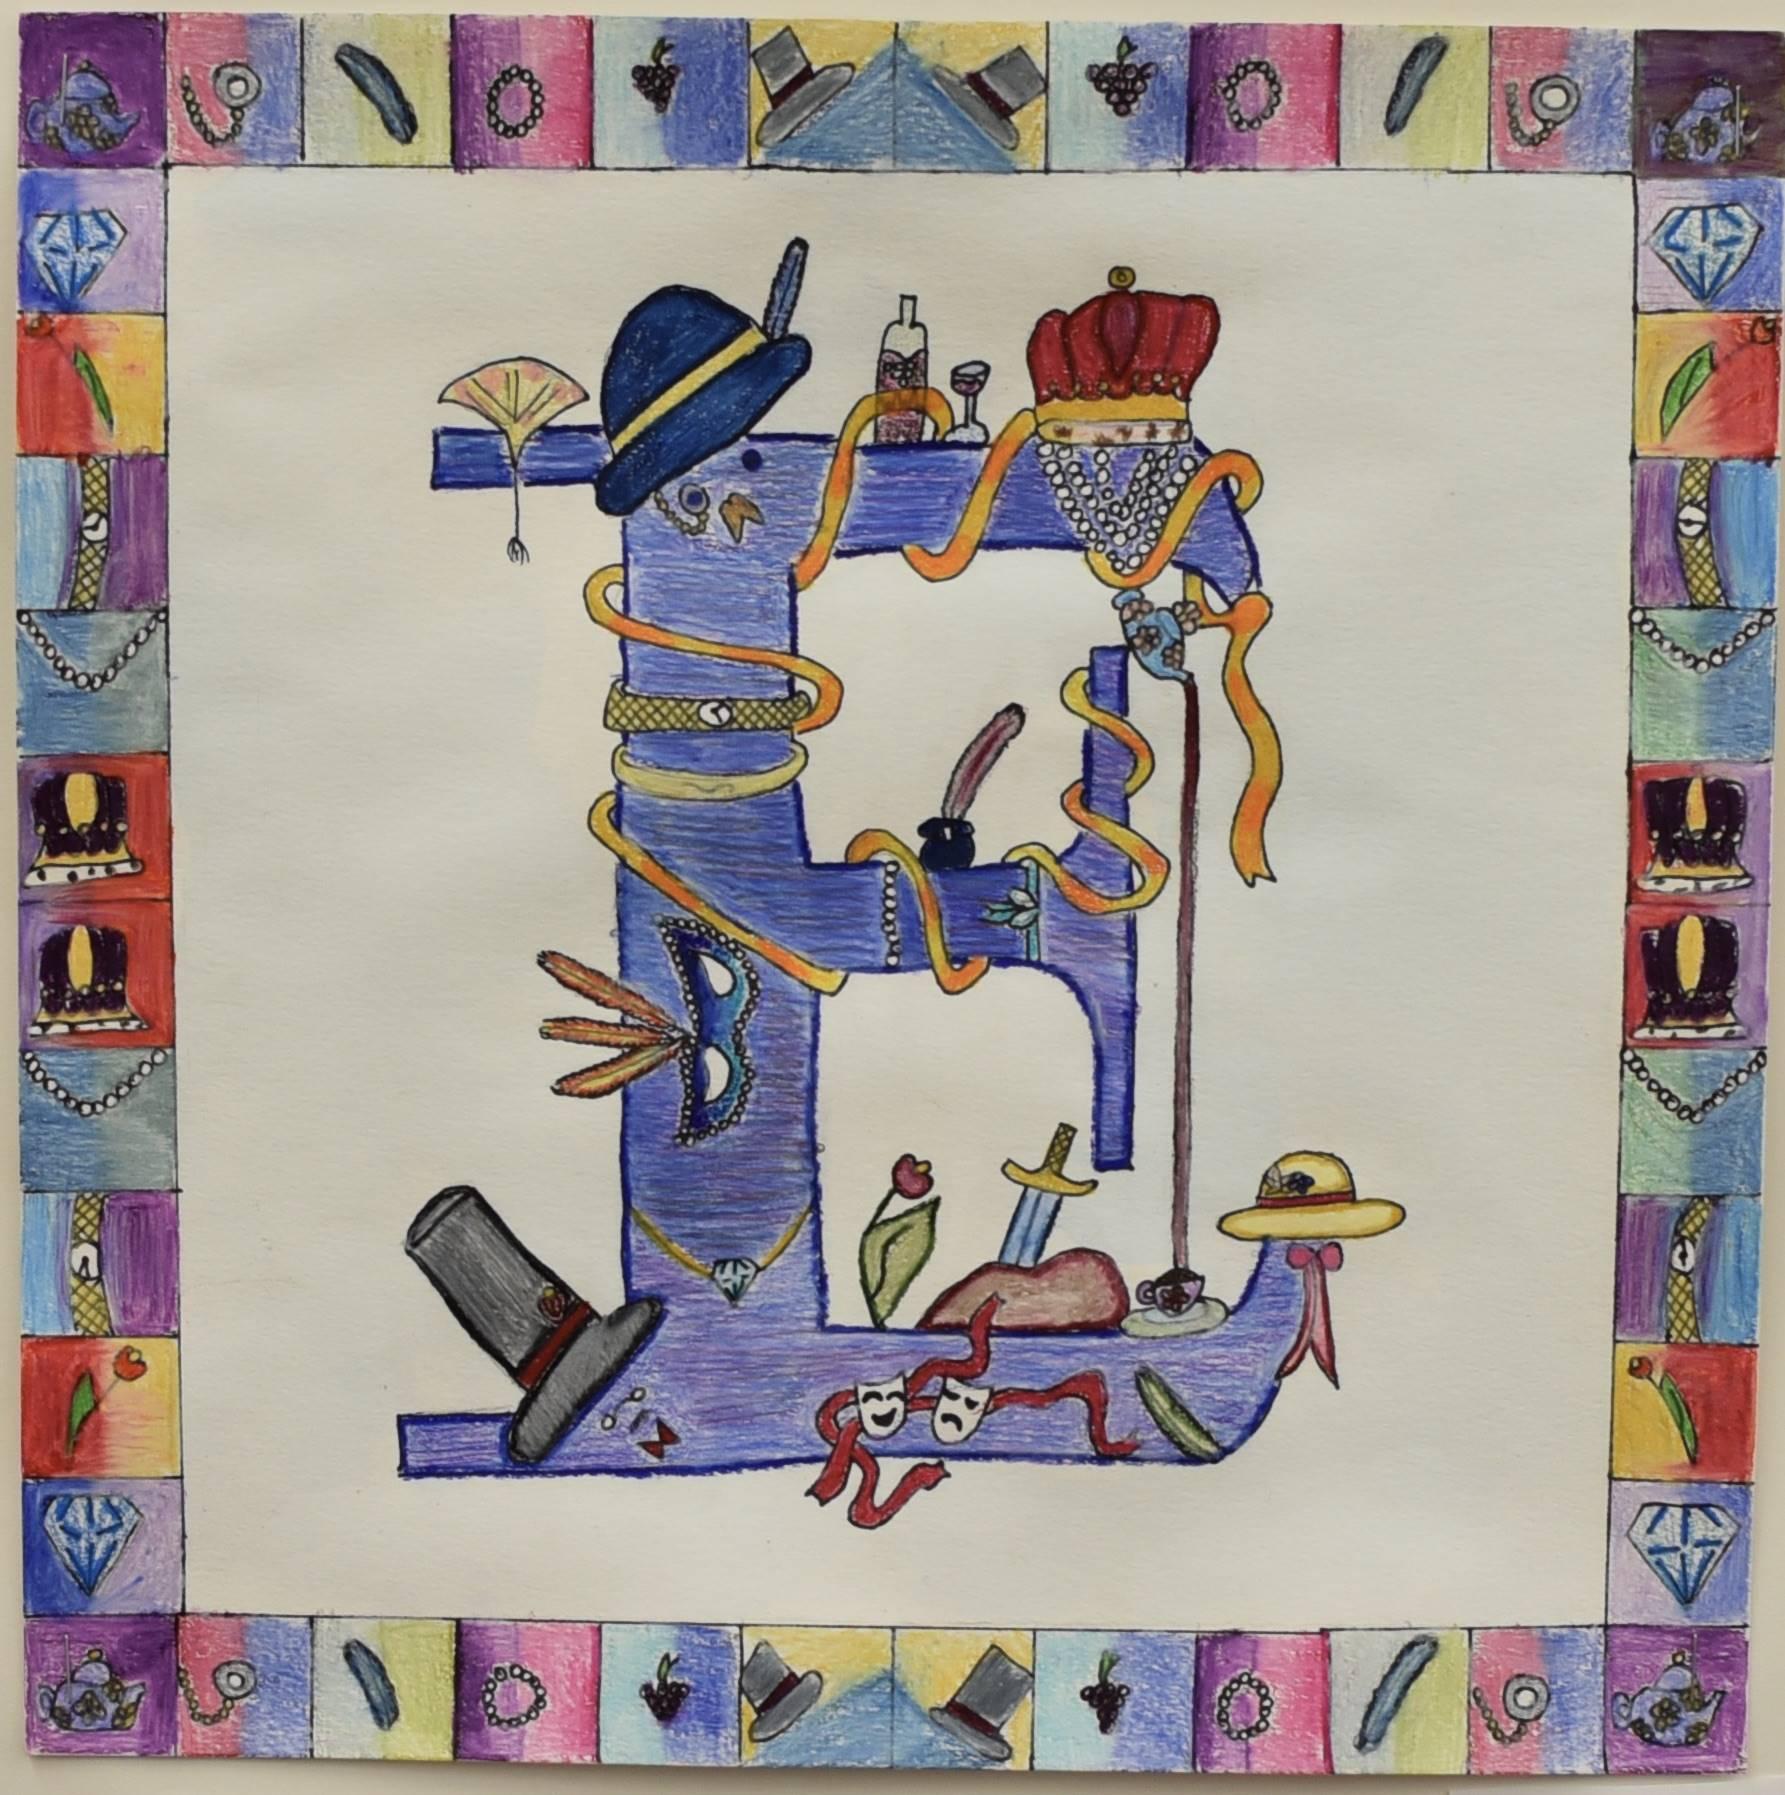 Brecksville-Broadview Hts. Middle School Art Projects 59